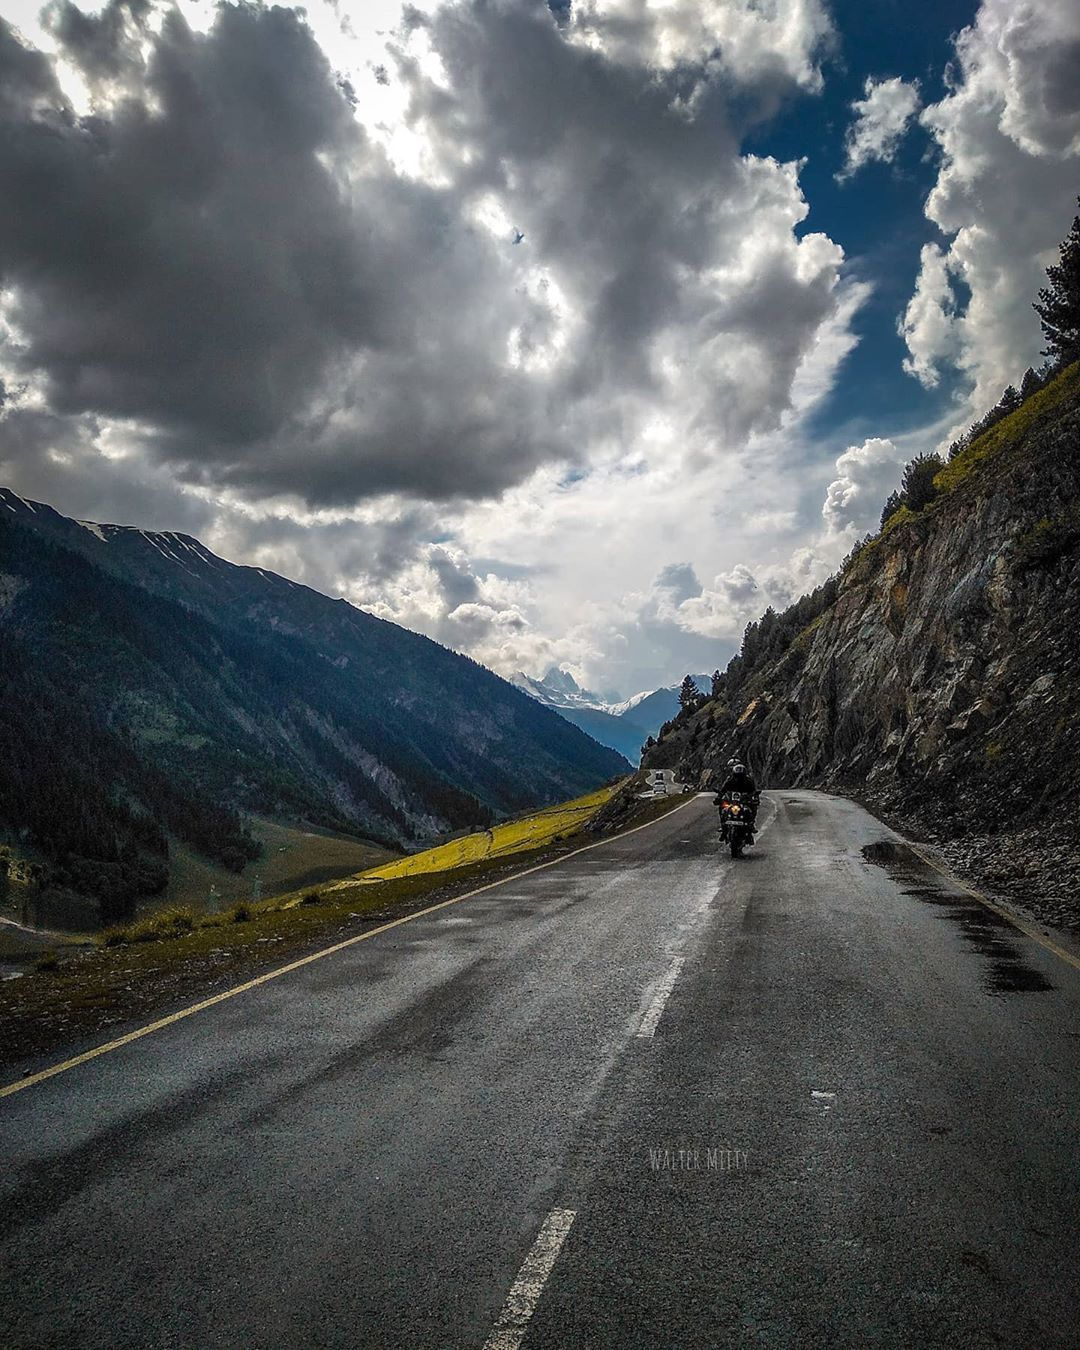 Chalo chale neele gagan k tale  #travel #travelling #travelgram #kashmir #himala